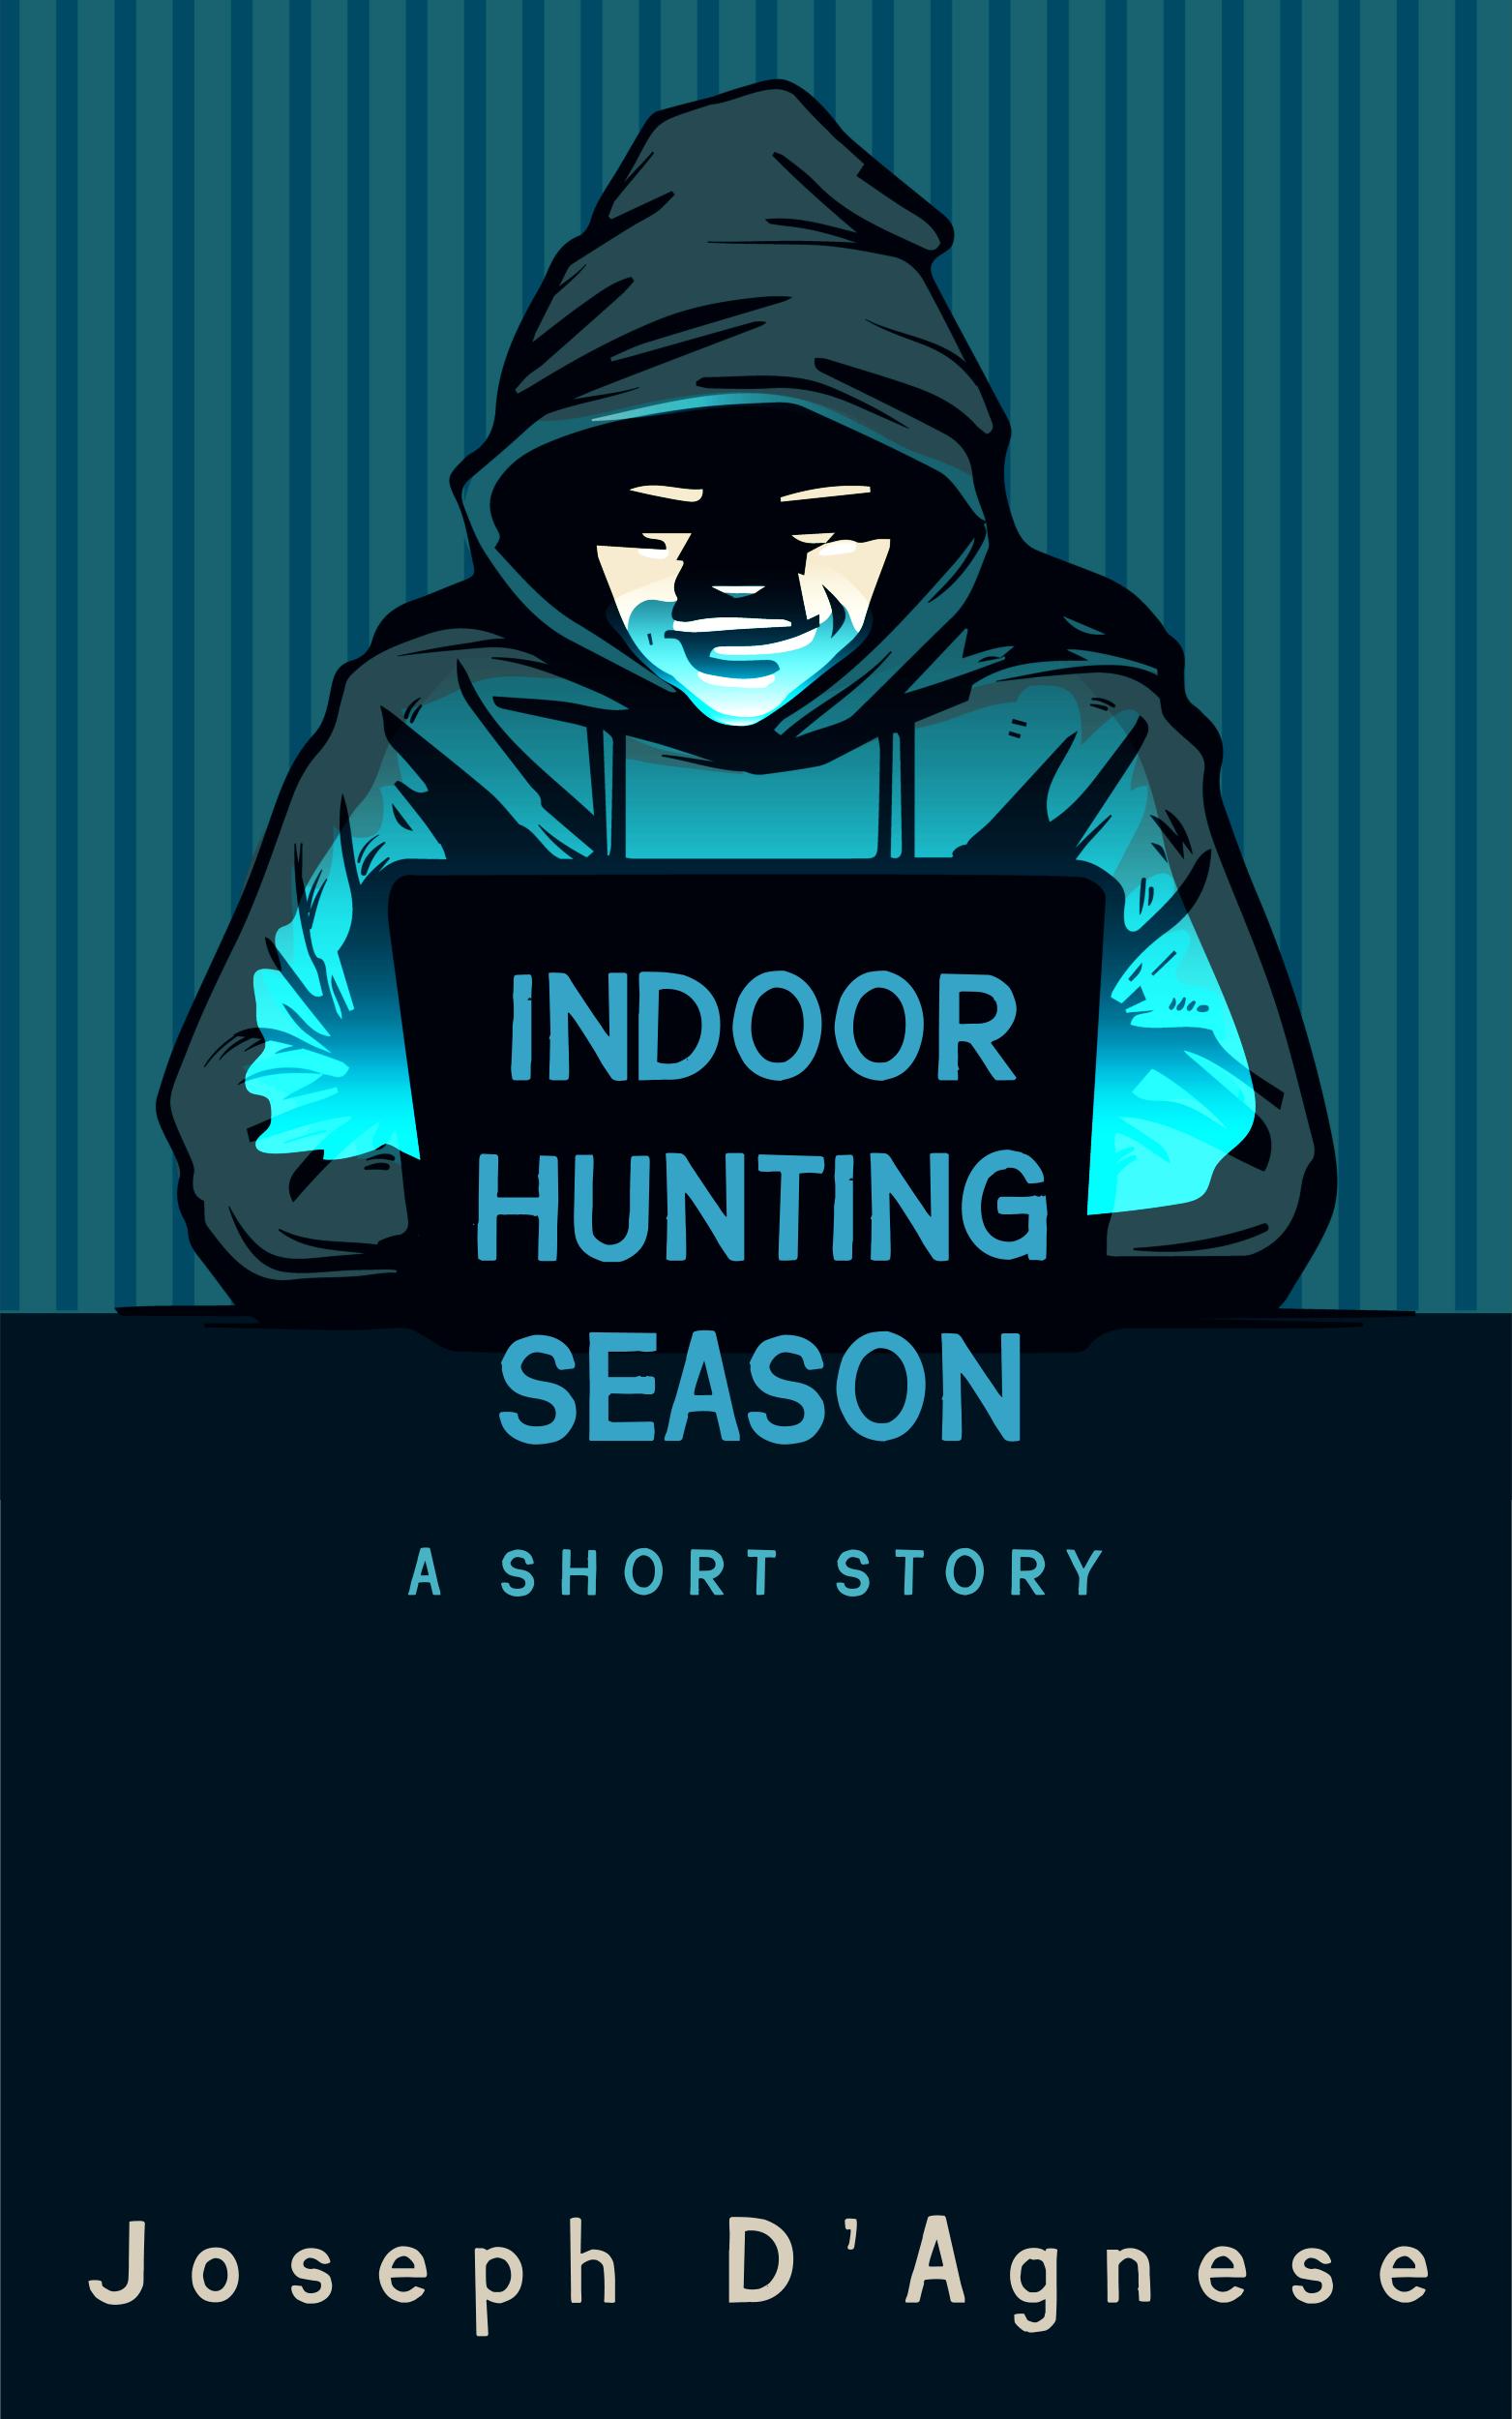 Indoor Hunting Season by Joseph D'Agnese